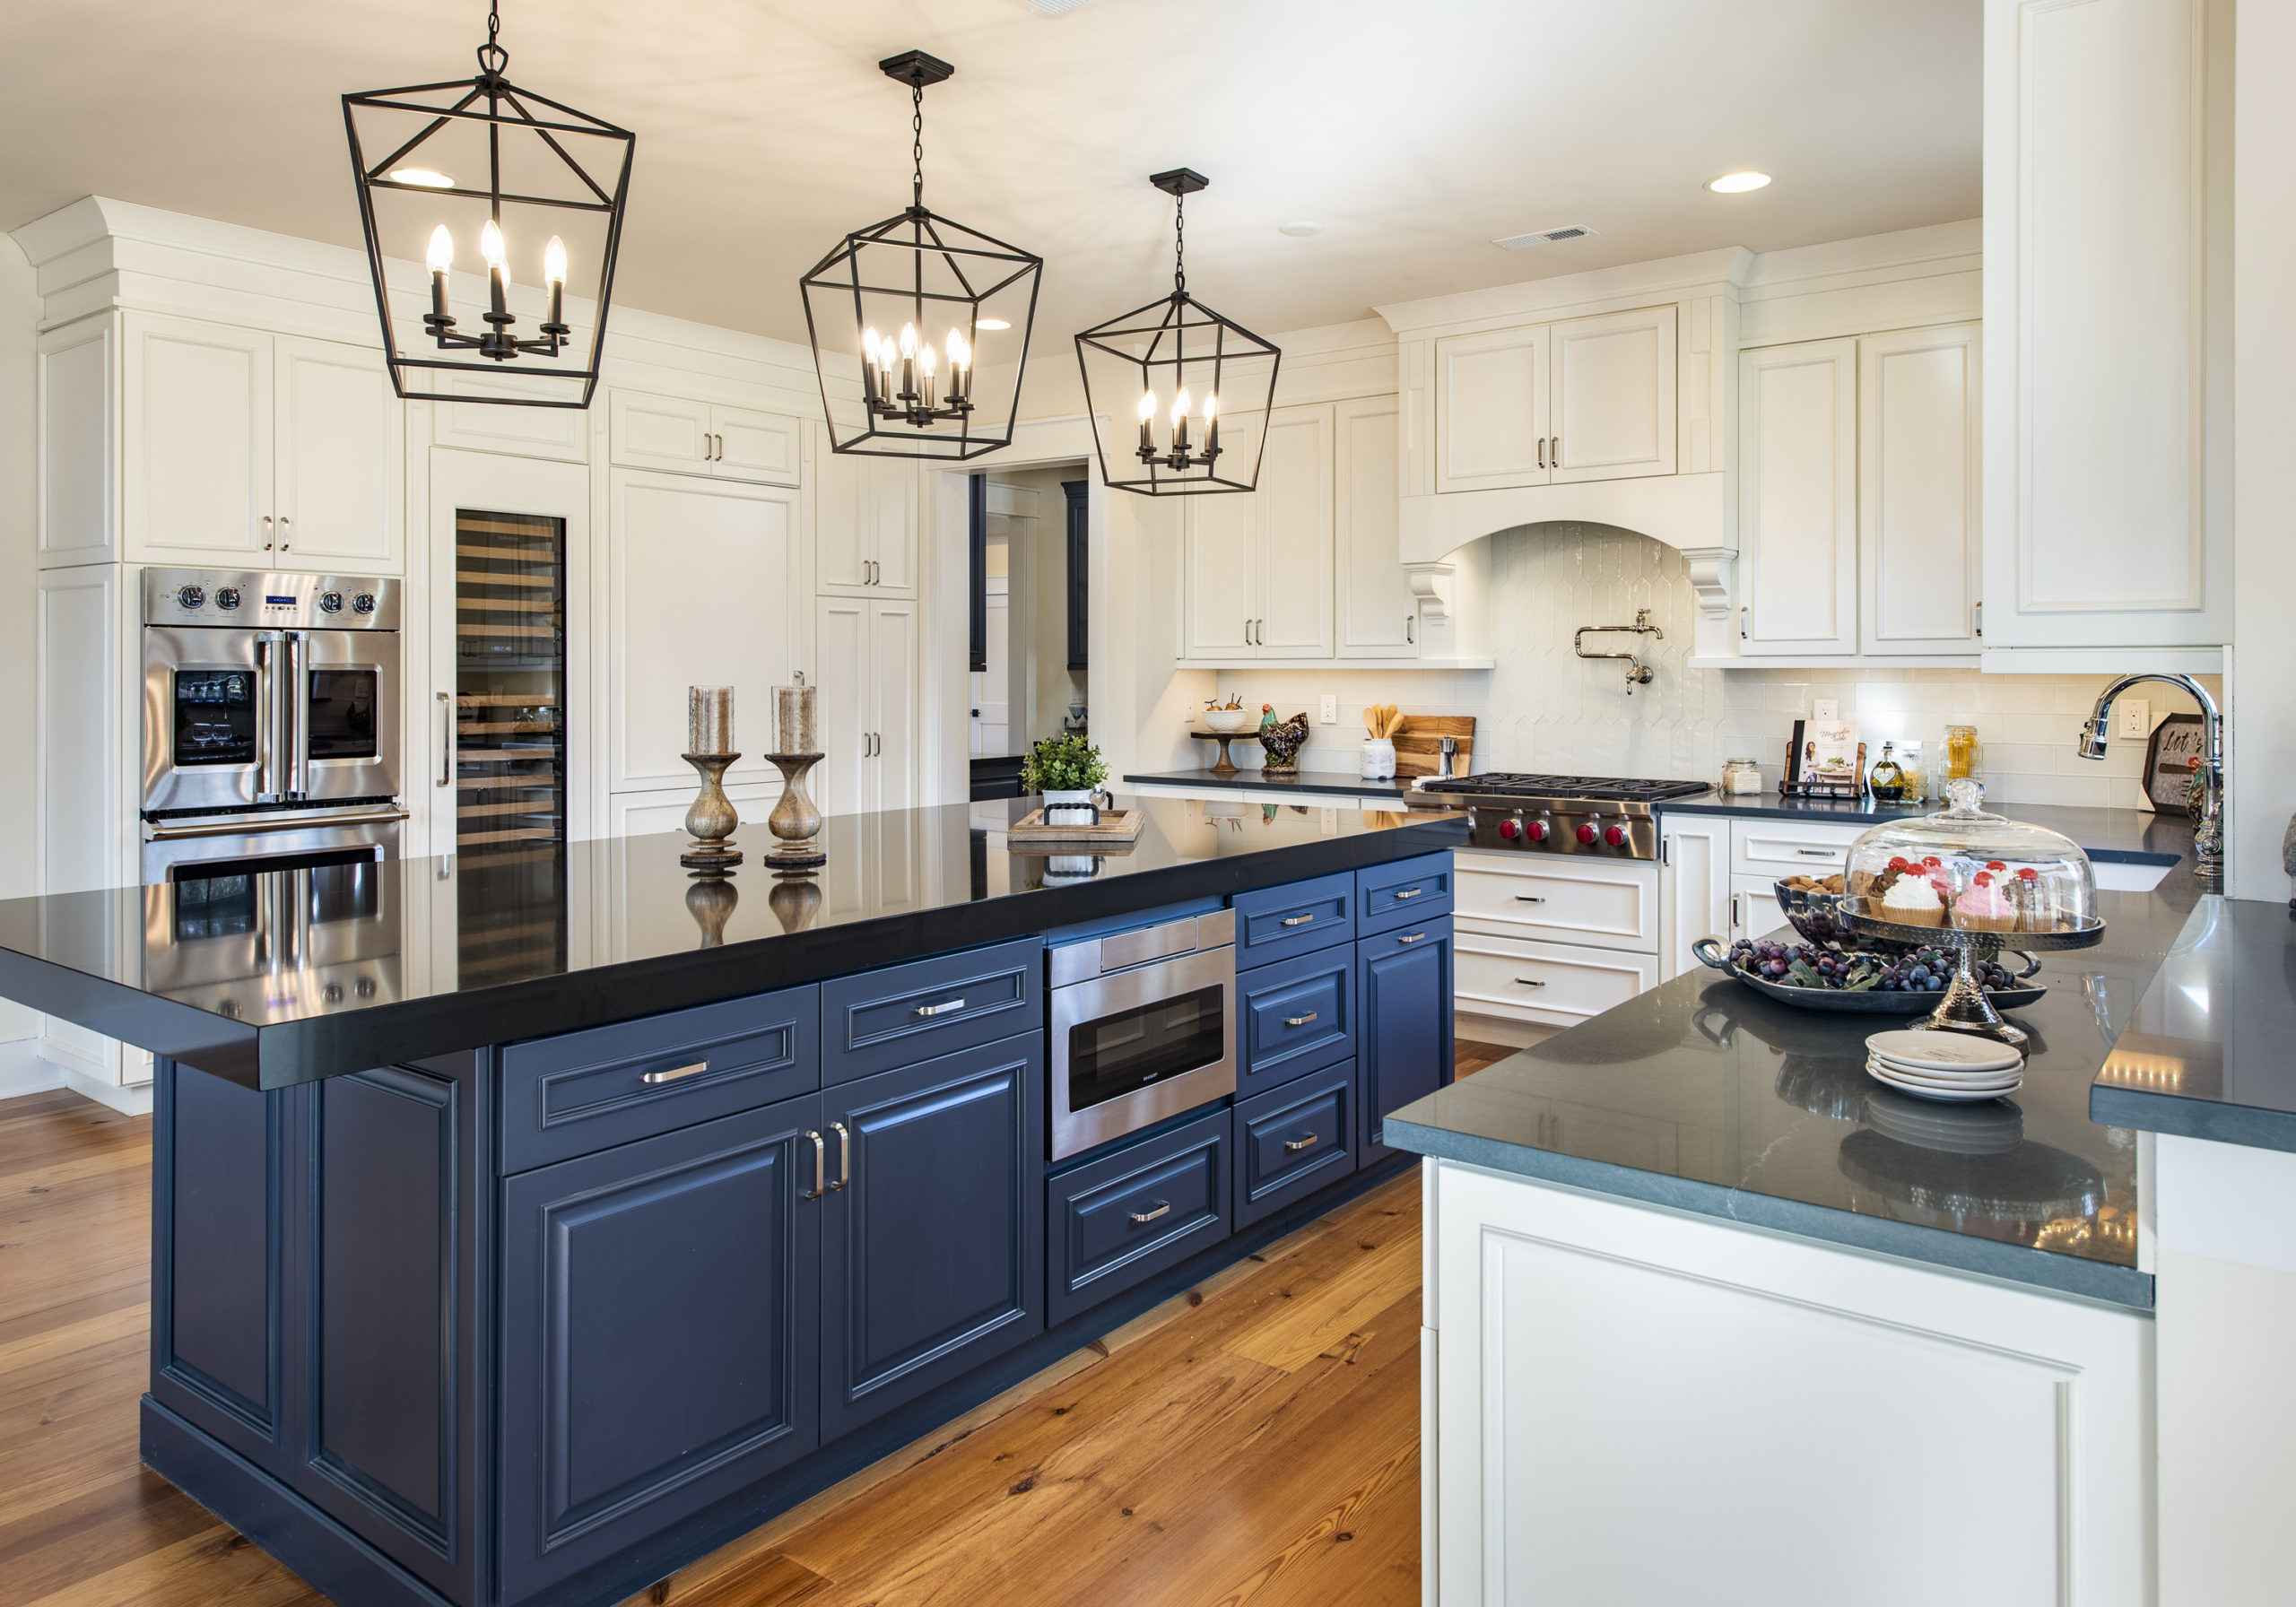 What Is Trending In Kitchen Design 2021?